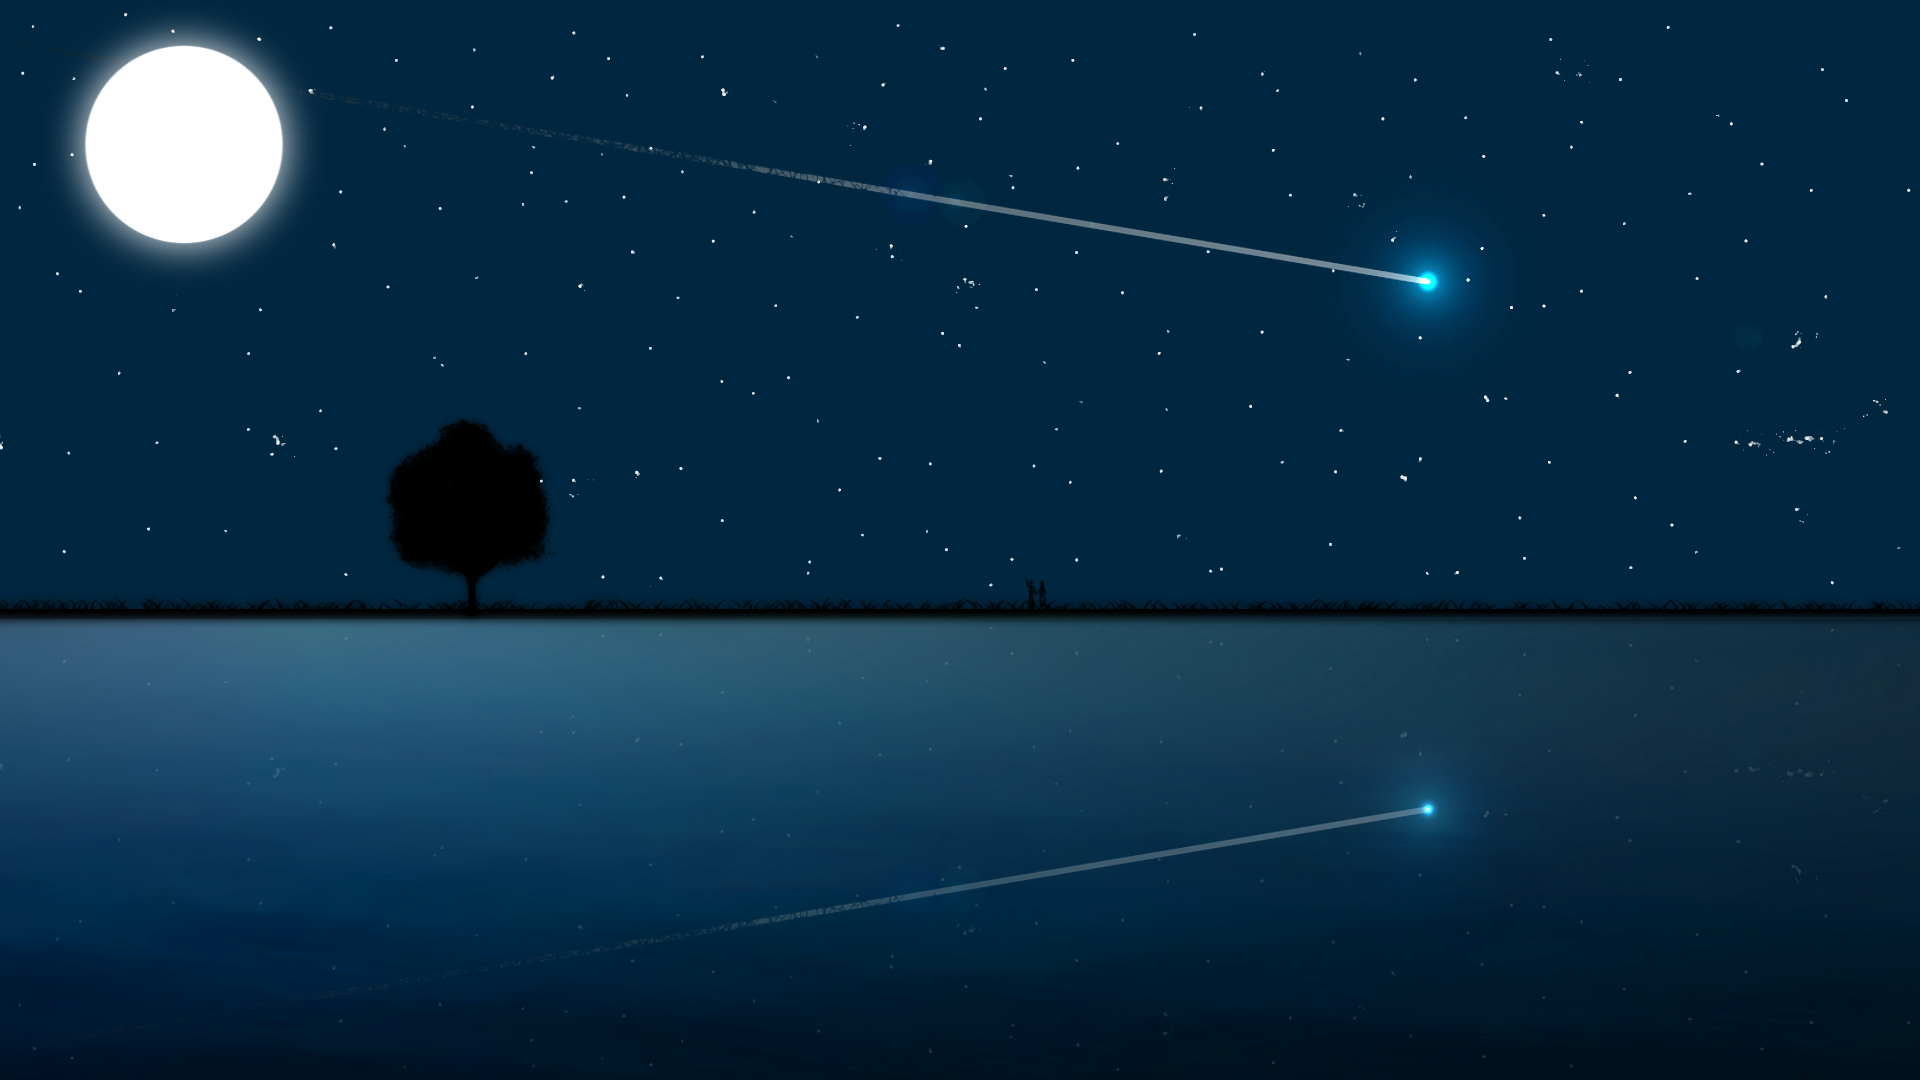 639613 Title Starry Sky Simplistic Artistic Night   Night Sky